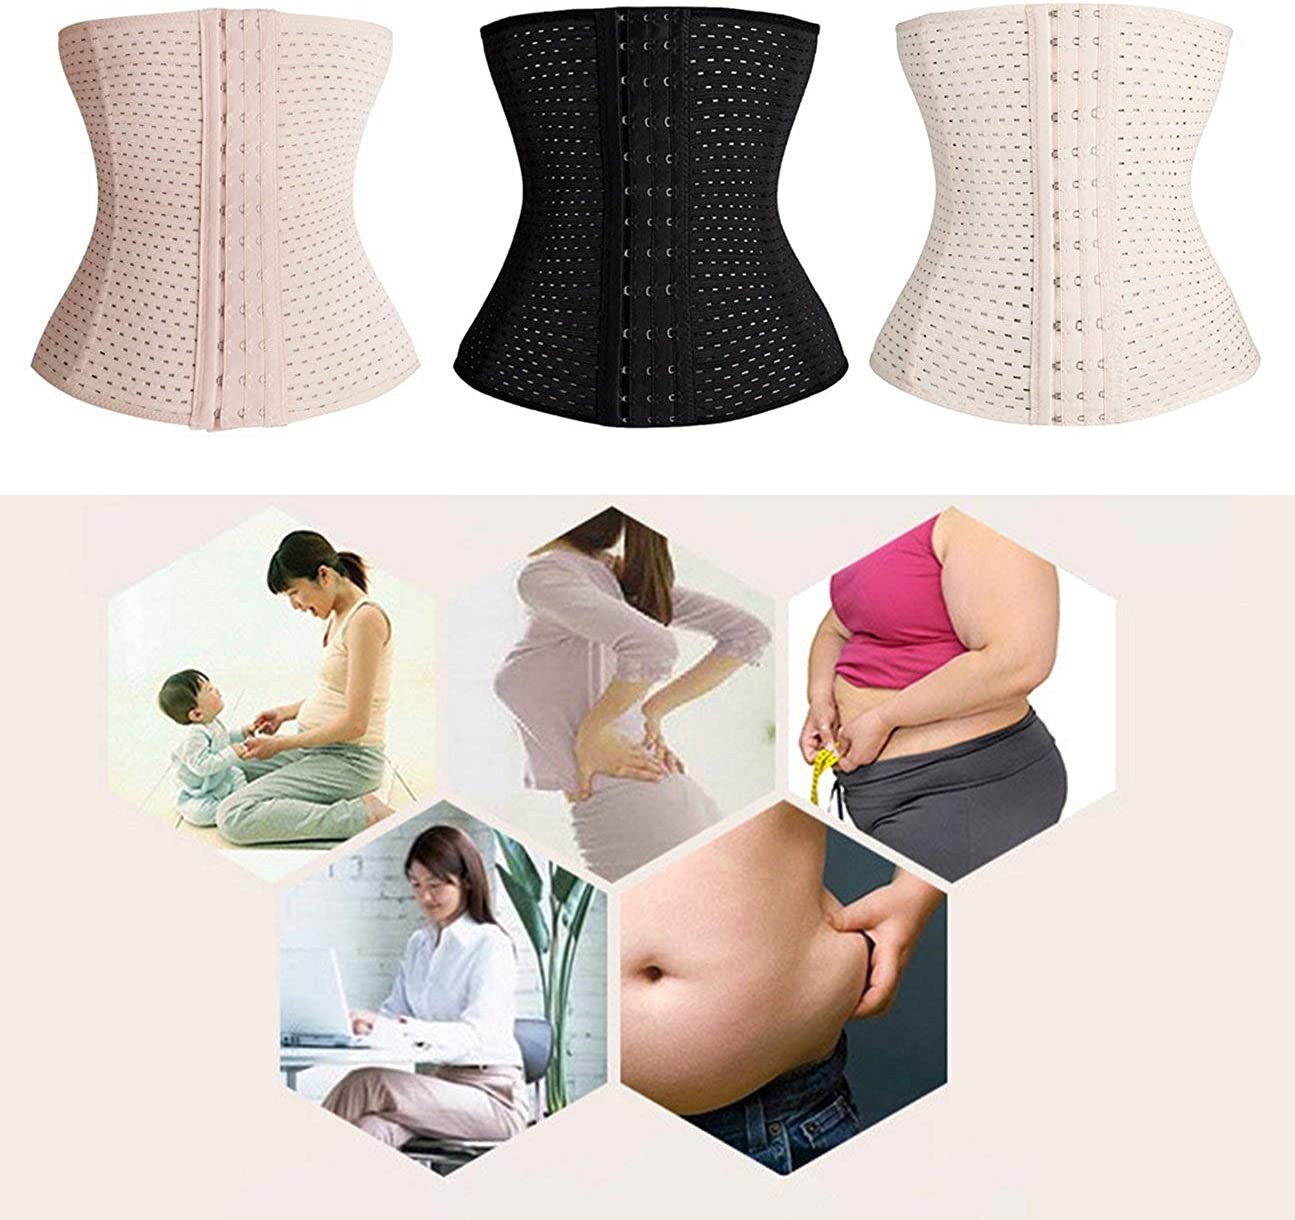 HIPENGYANBAIHU Women Slimming Corset Waist Trainer Cincher Body Beauty Shaper Postpartum Belly Band Underbust Tummy Control Belt